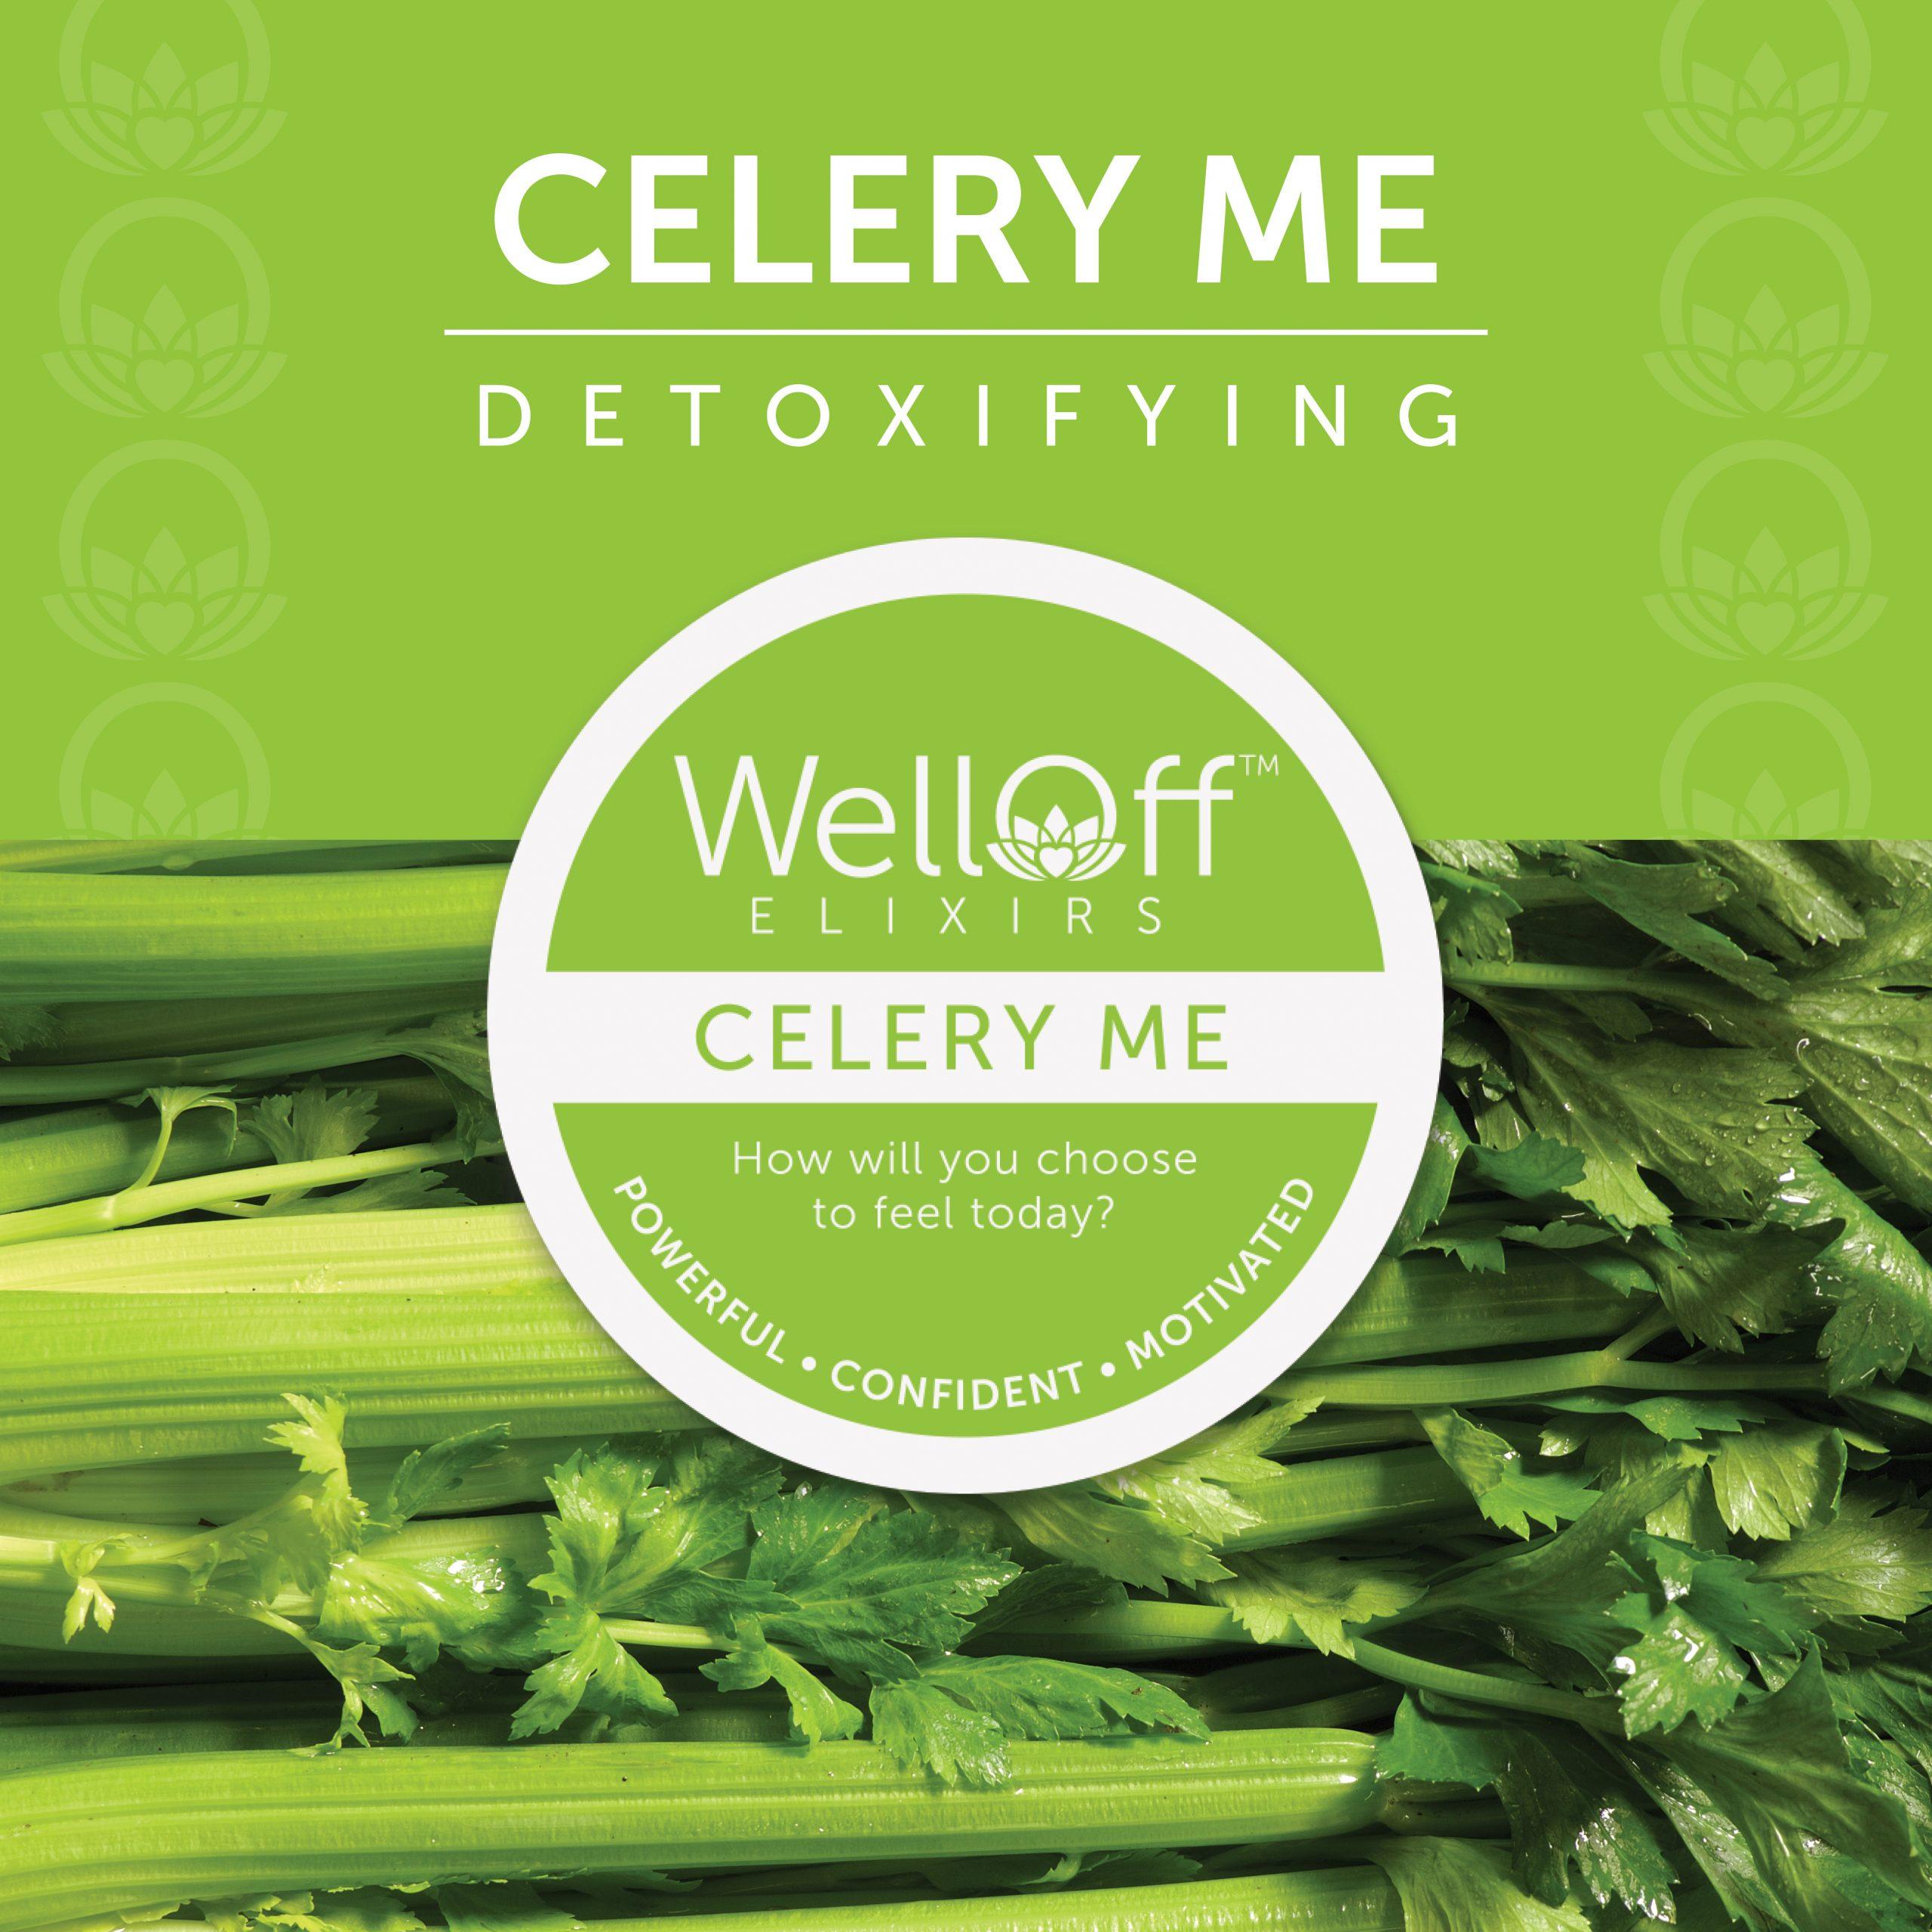 Celery Me Elixir